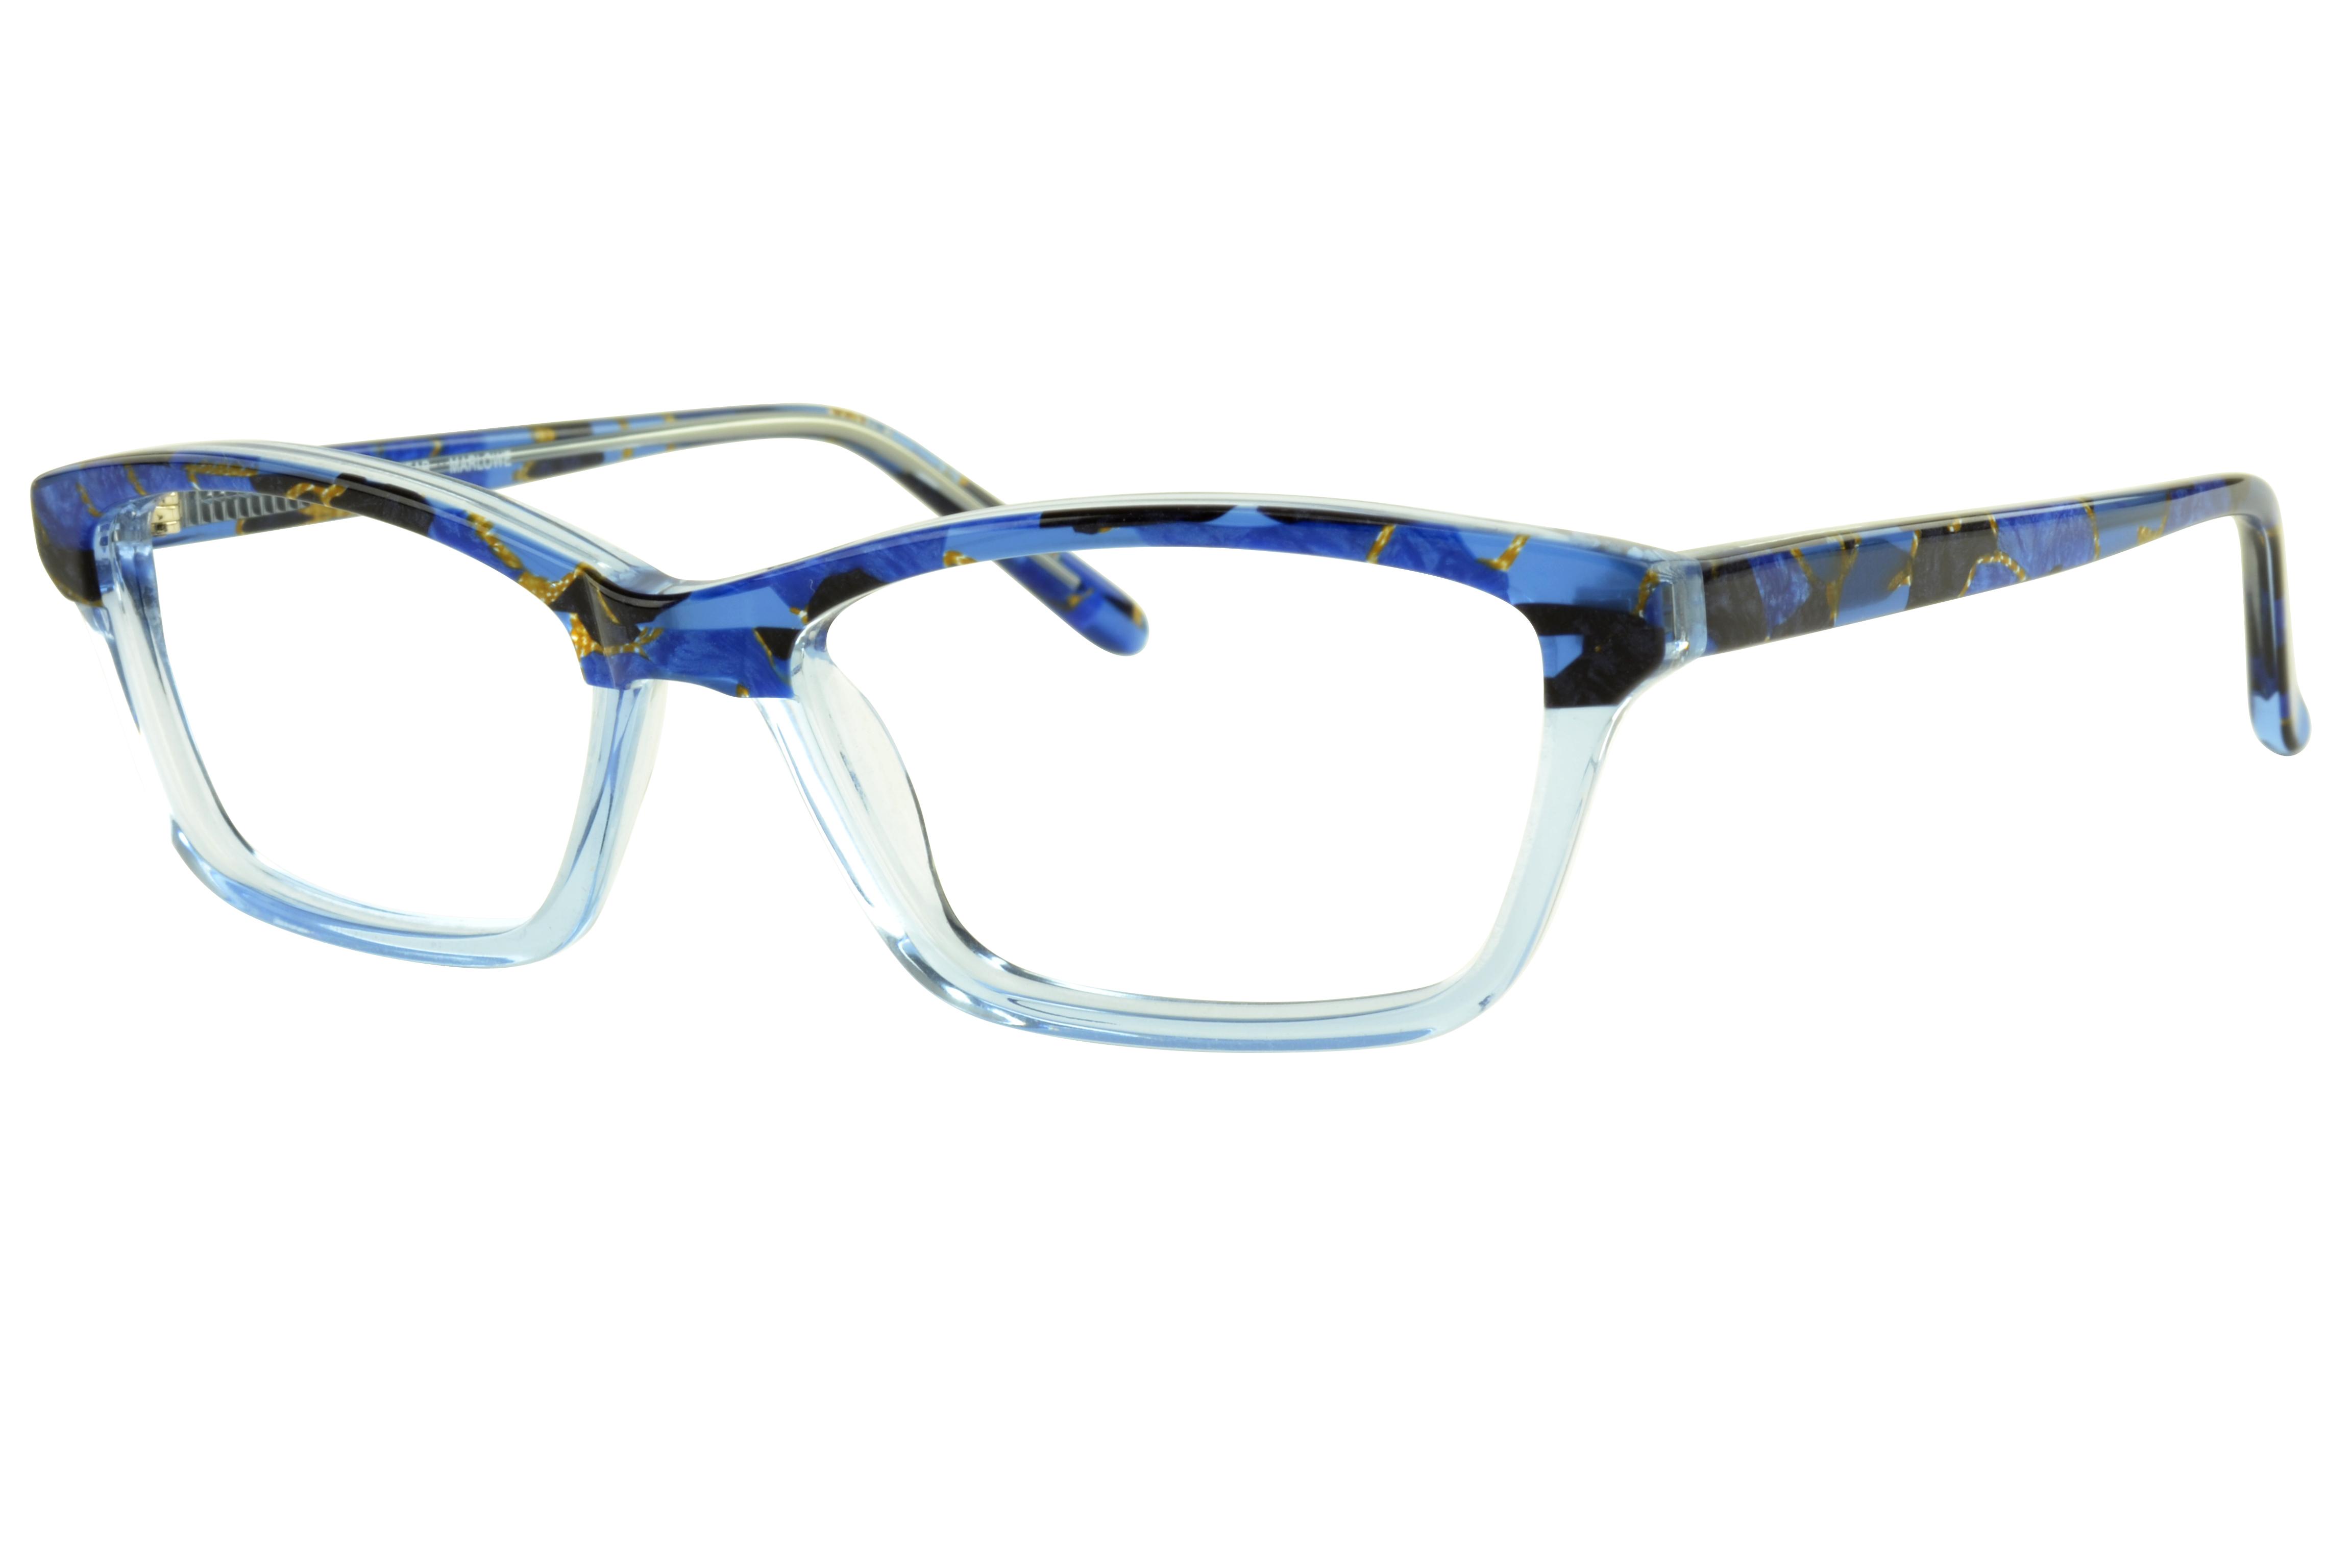 Dolabany Eyewear Marlowe Blue Crystal